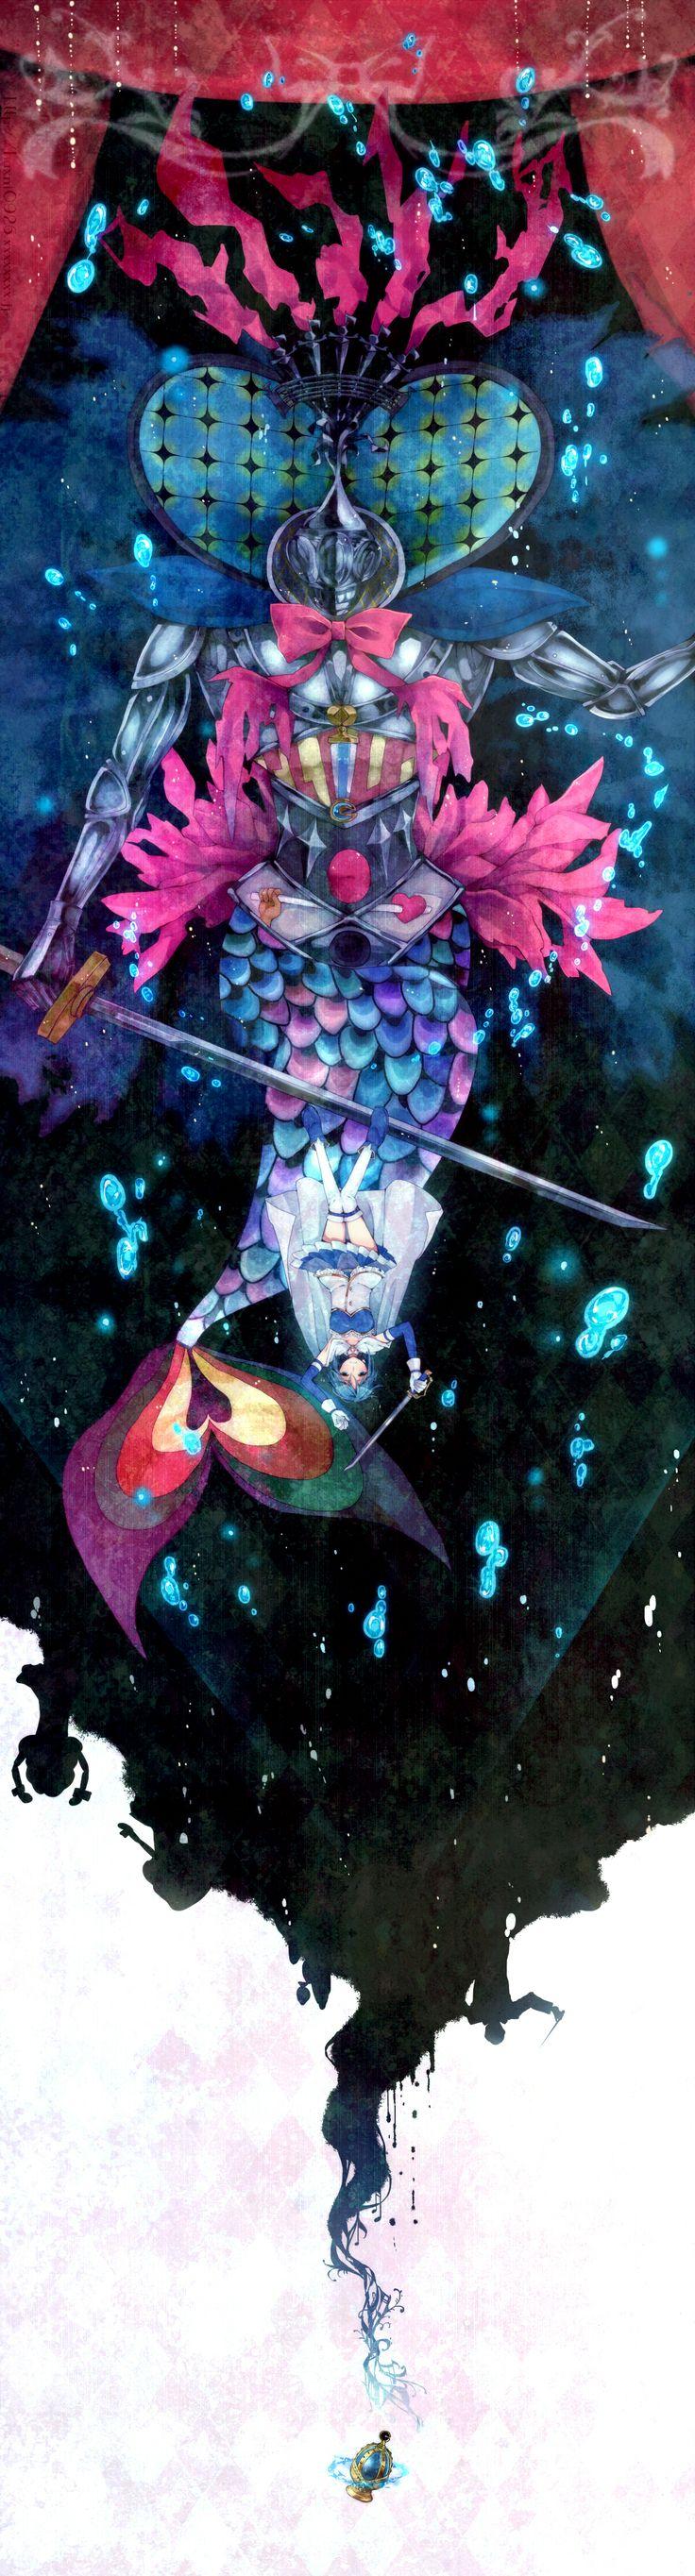 madoka magica sayaka witch - photo #39